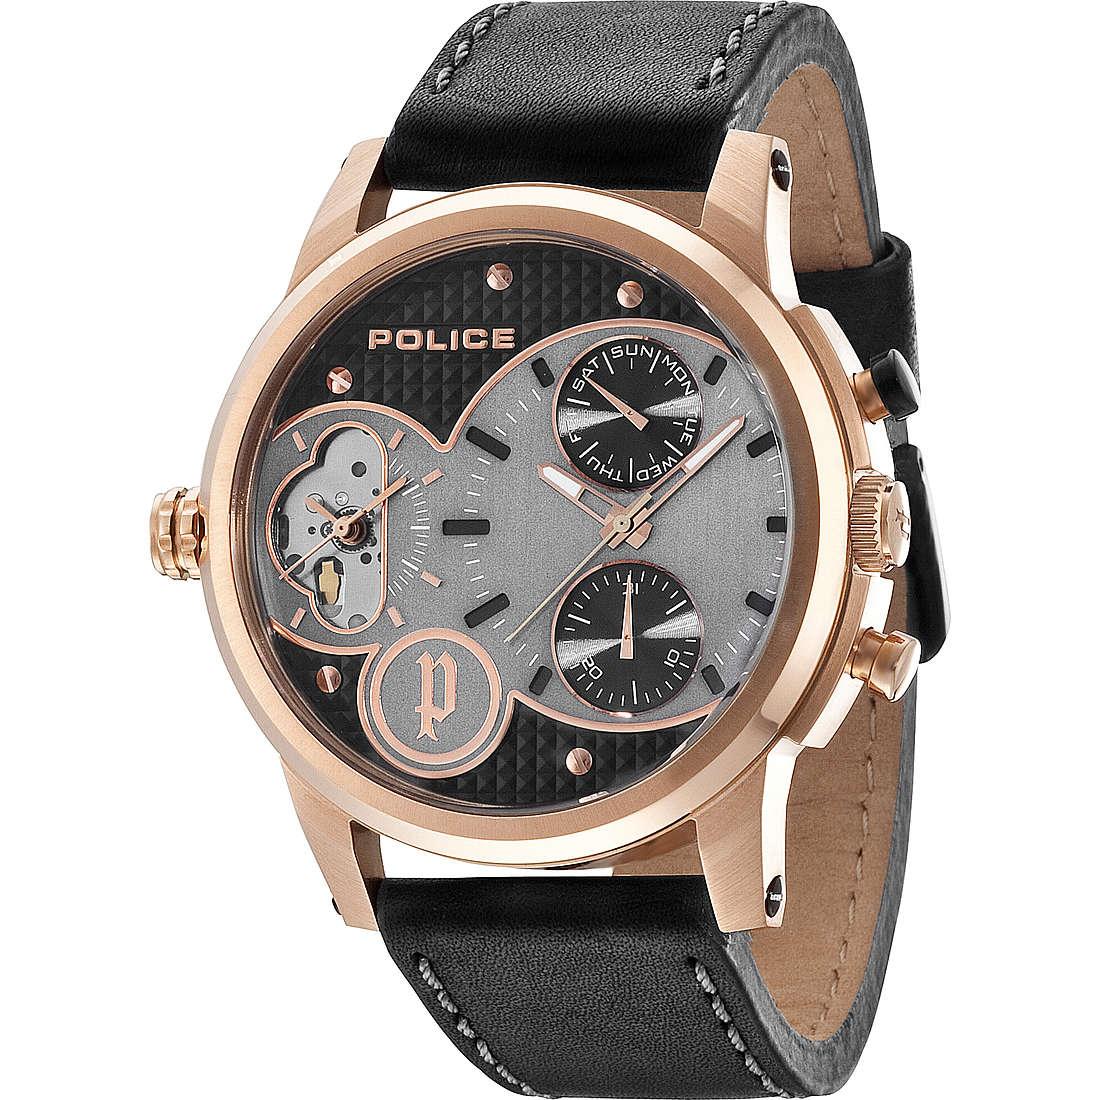 watch multifunction man Police Diamondback R1451241001